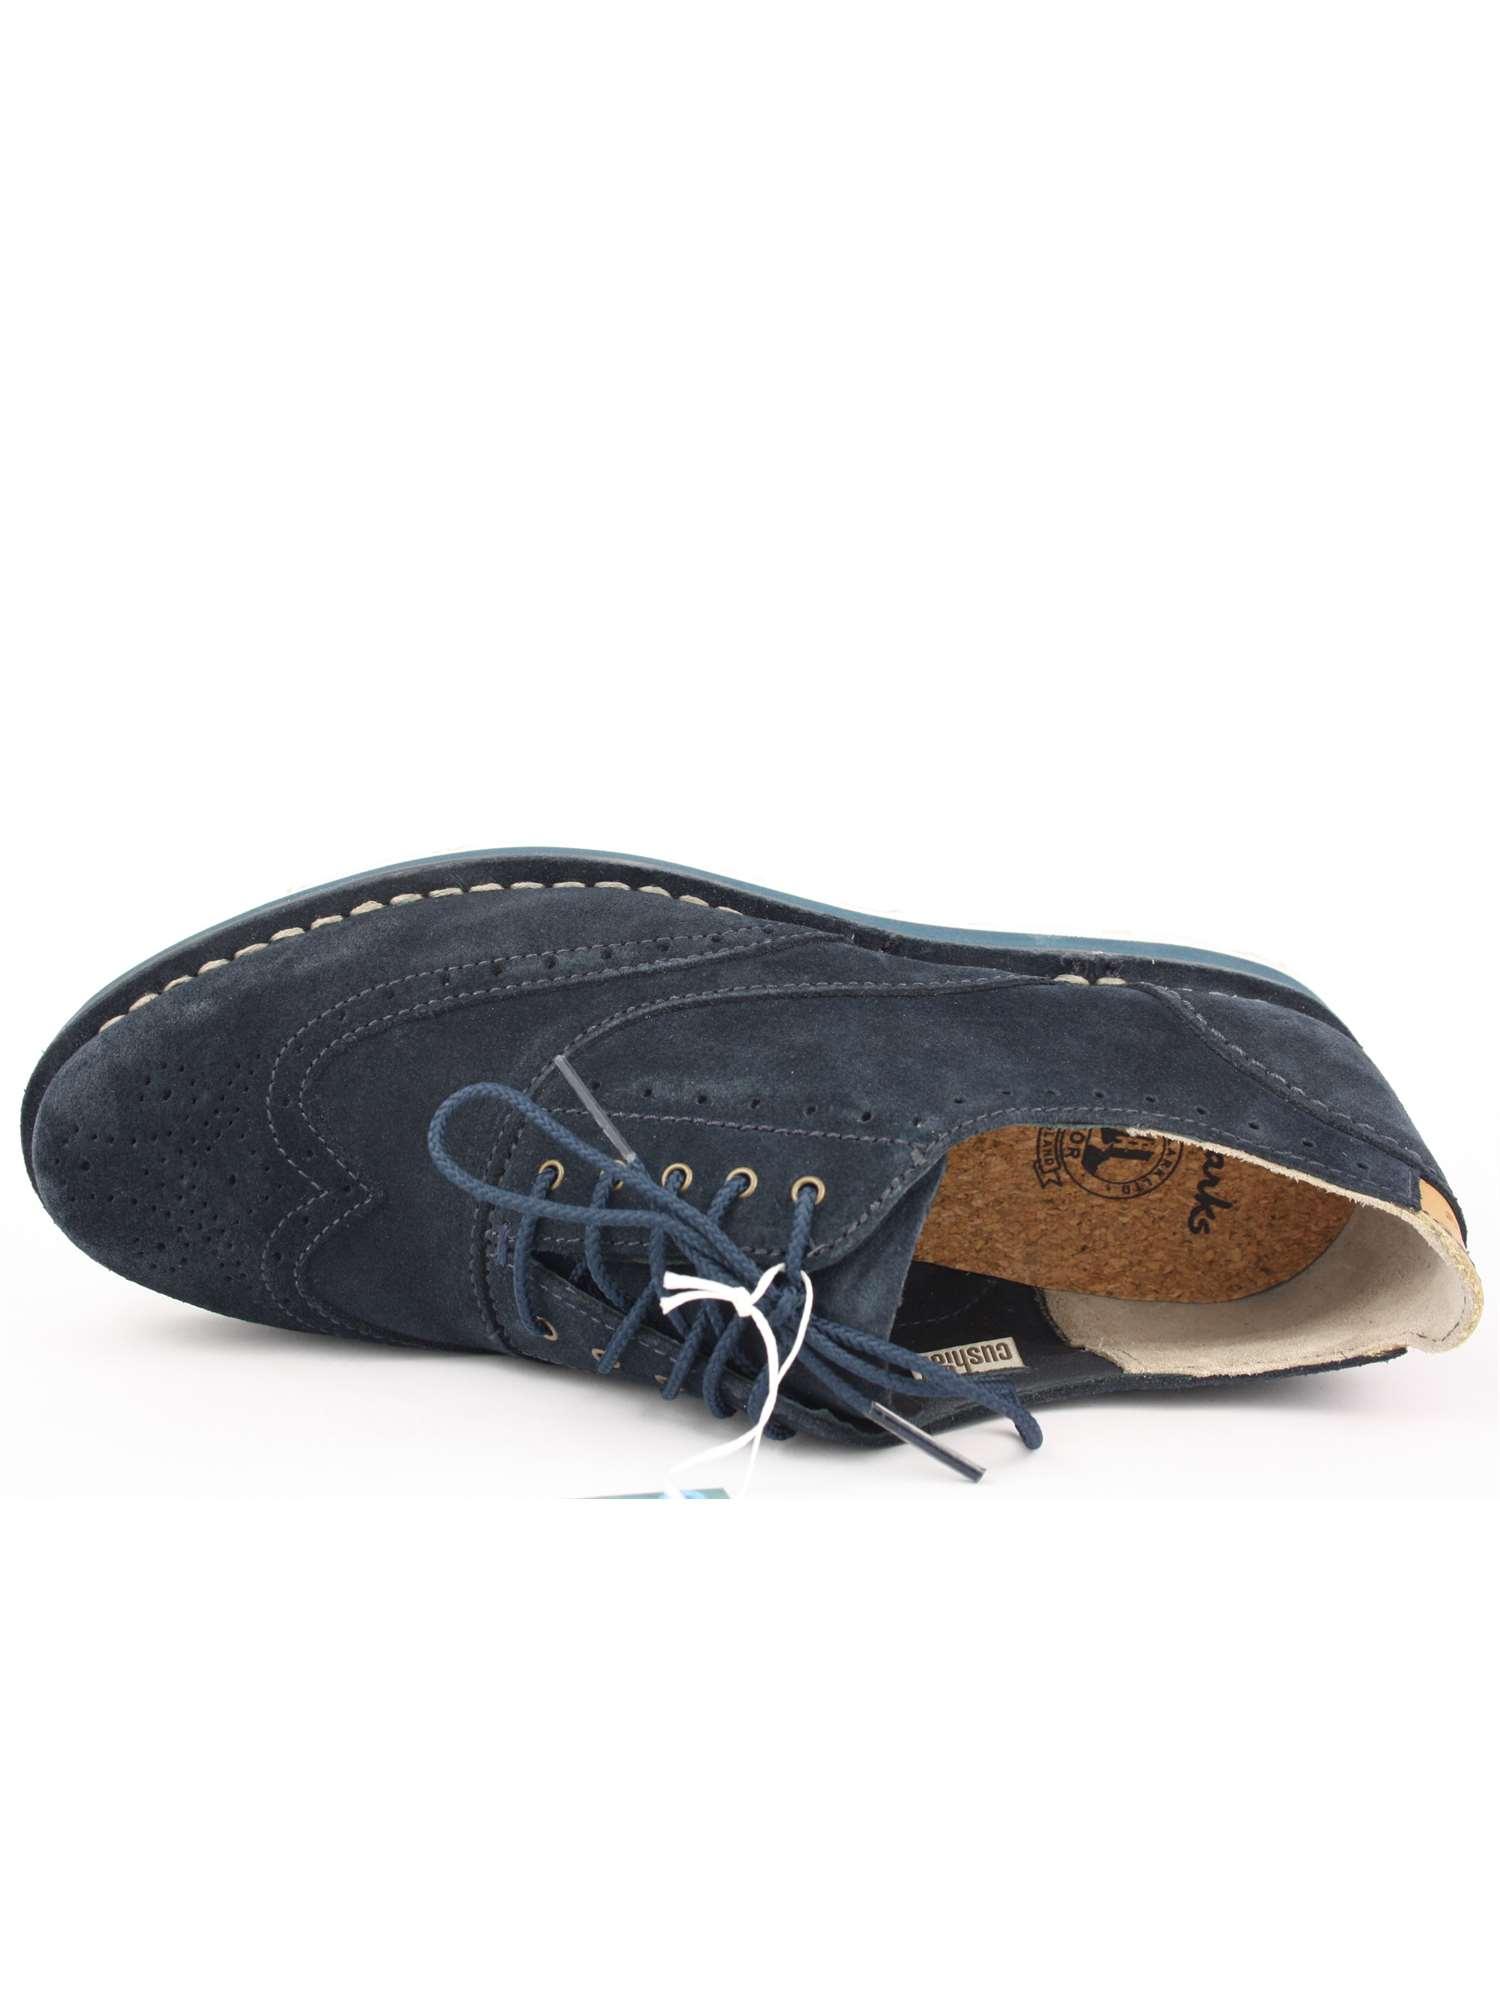 best sneakers aa6c4 24f40 Clarks Lacci Scarpa Tipo Inglese Blu   Lacci Scarpa Tipo ...